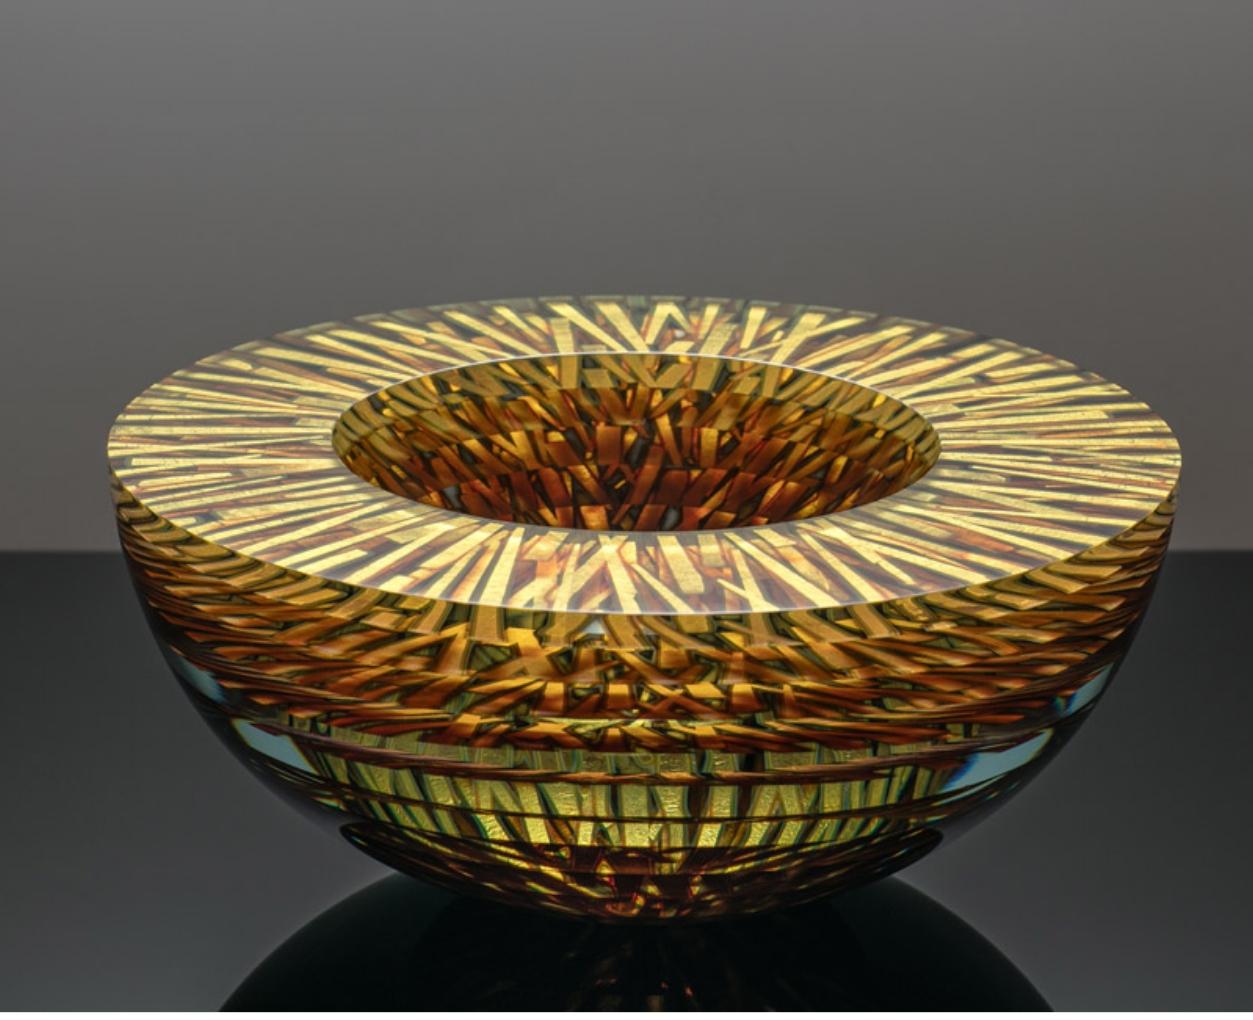 Glass art by Tomas Hlavicka